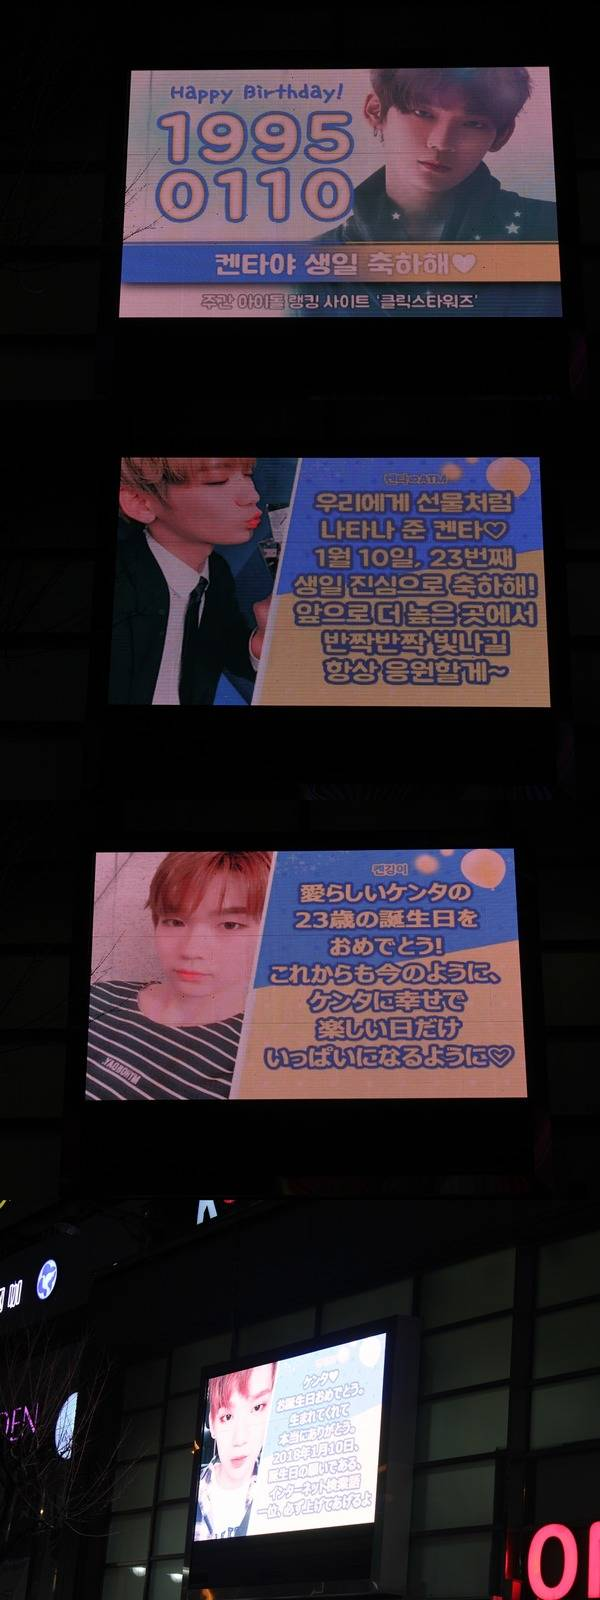 東京・新大久保電光掲示板で祝福動画を上映。 写真:Click! StarWars